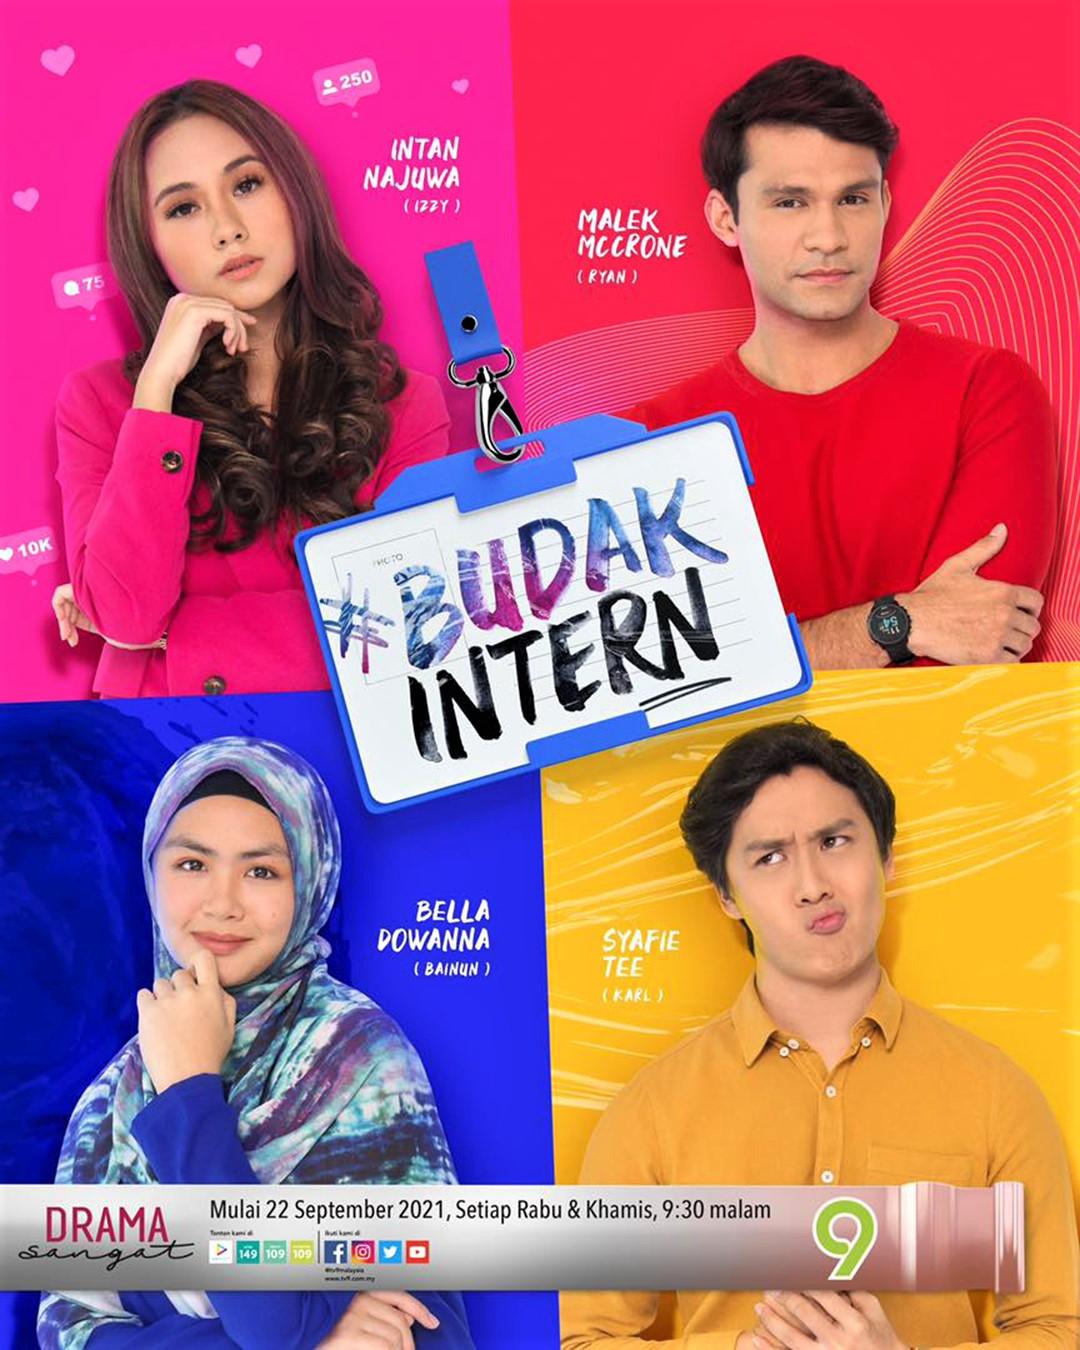 Budak Intern Episod TV9